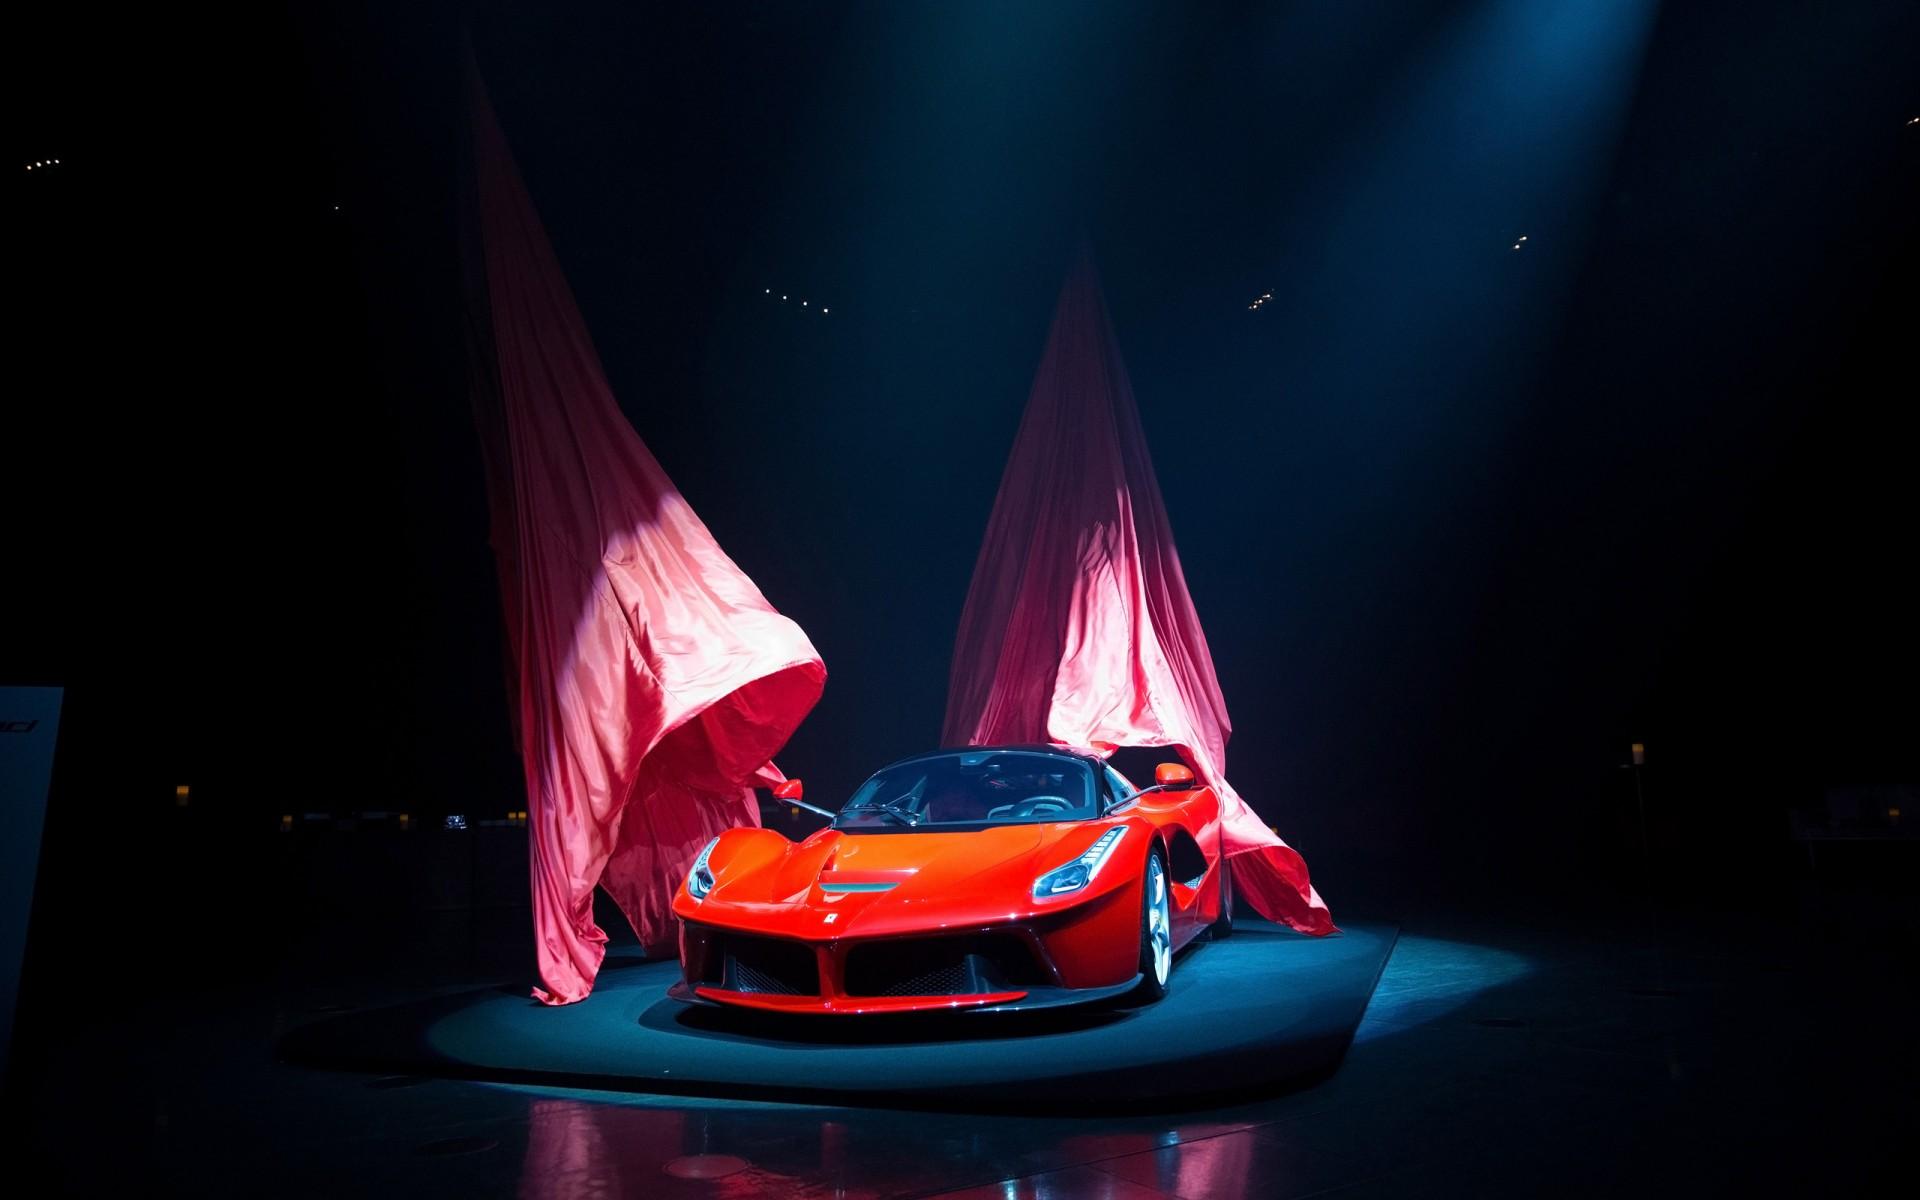 x 1200 - Ferrari Laferrari Wallpaper Hd For Desktop